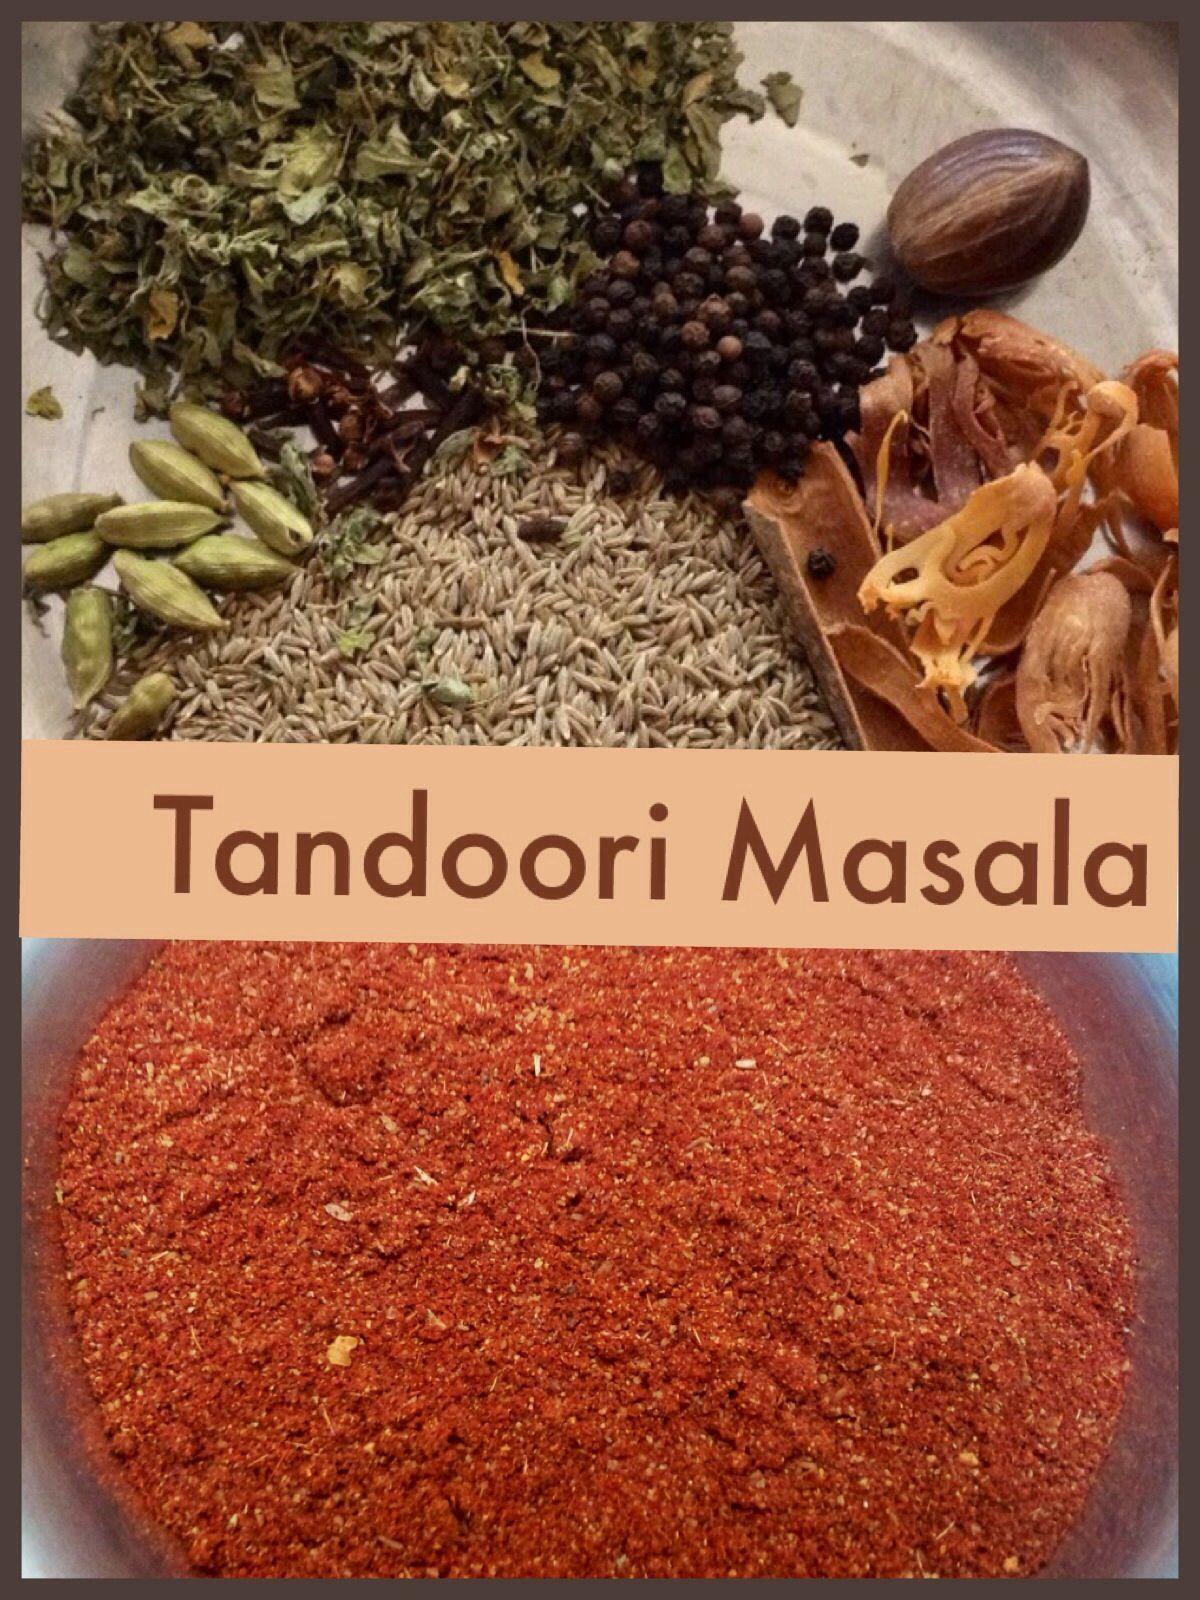 how to make tandoori masala spice mix